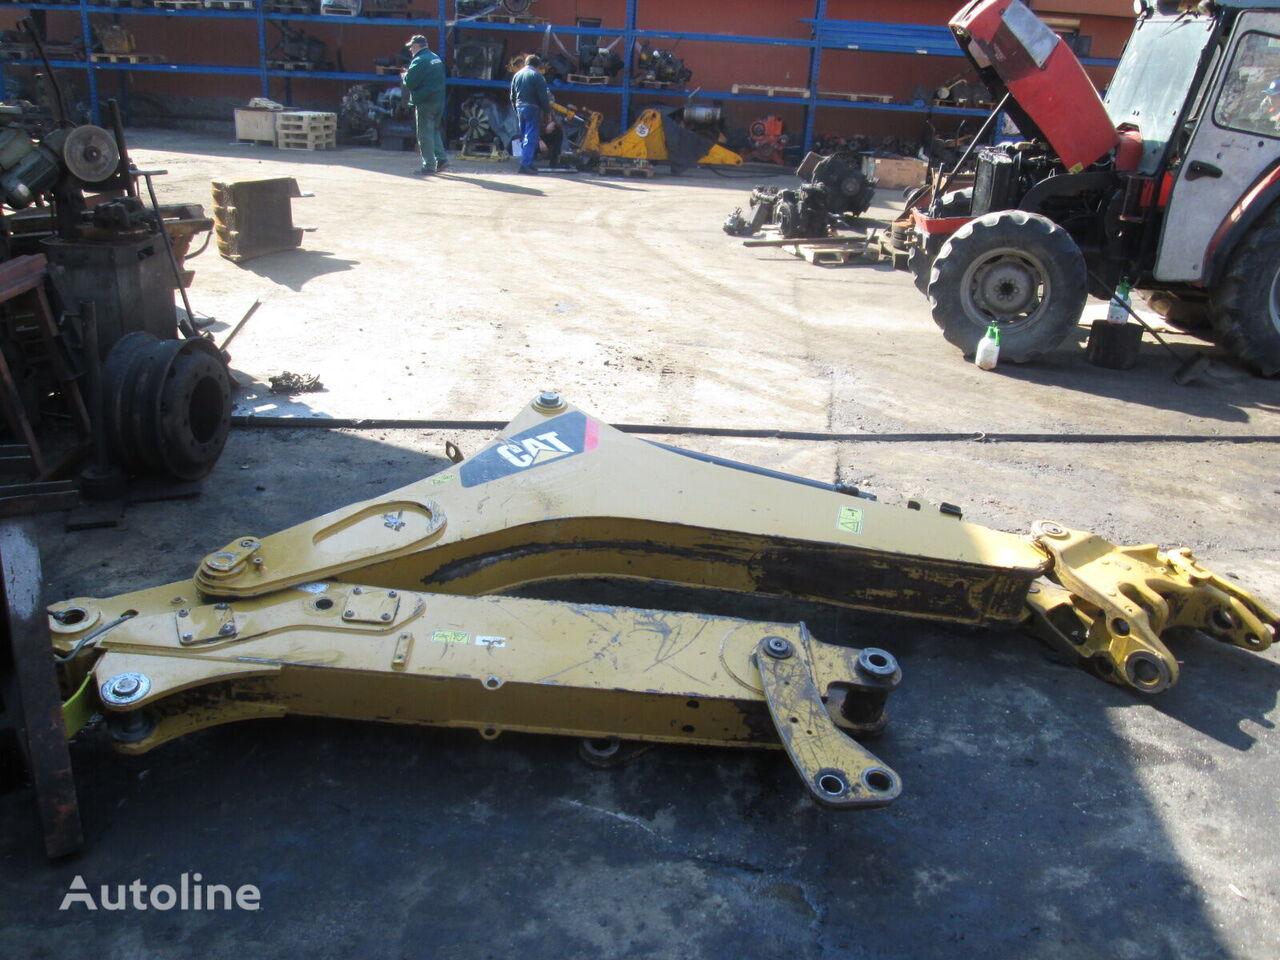 CATERPILLAR excavator boom for CATERPILLAR 428E backhoe loader